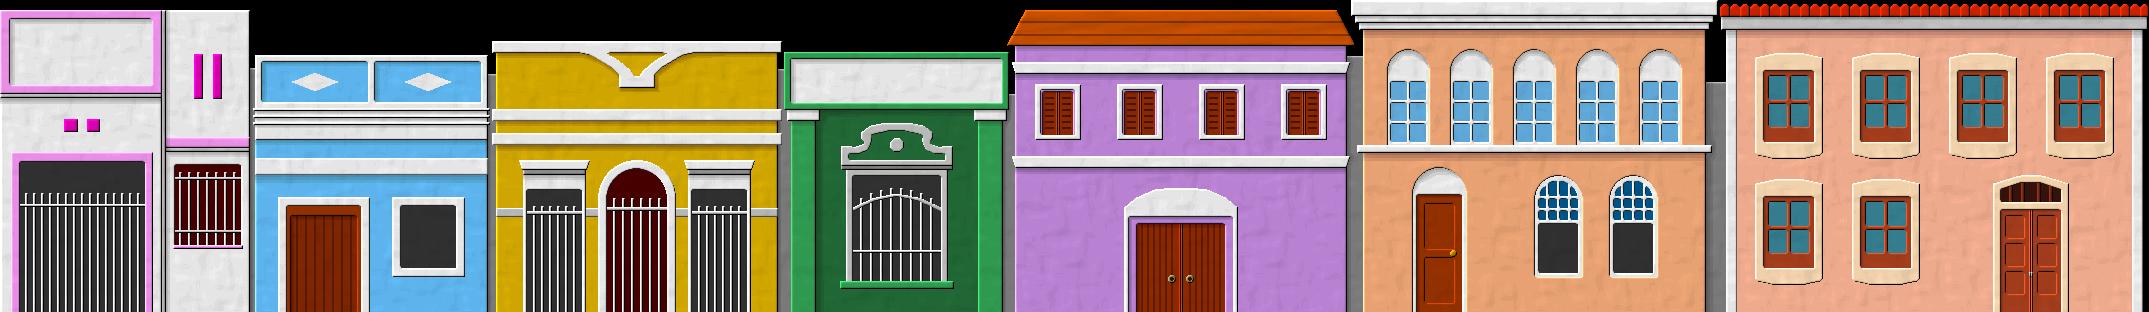 Olinda Street by Herbertrocha